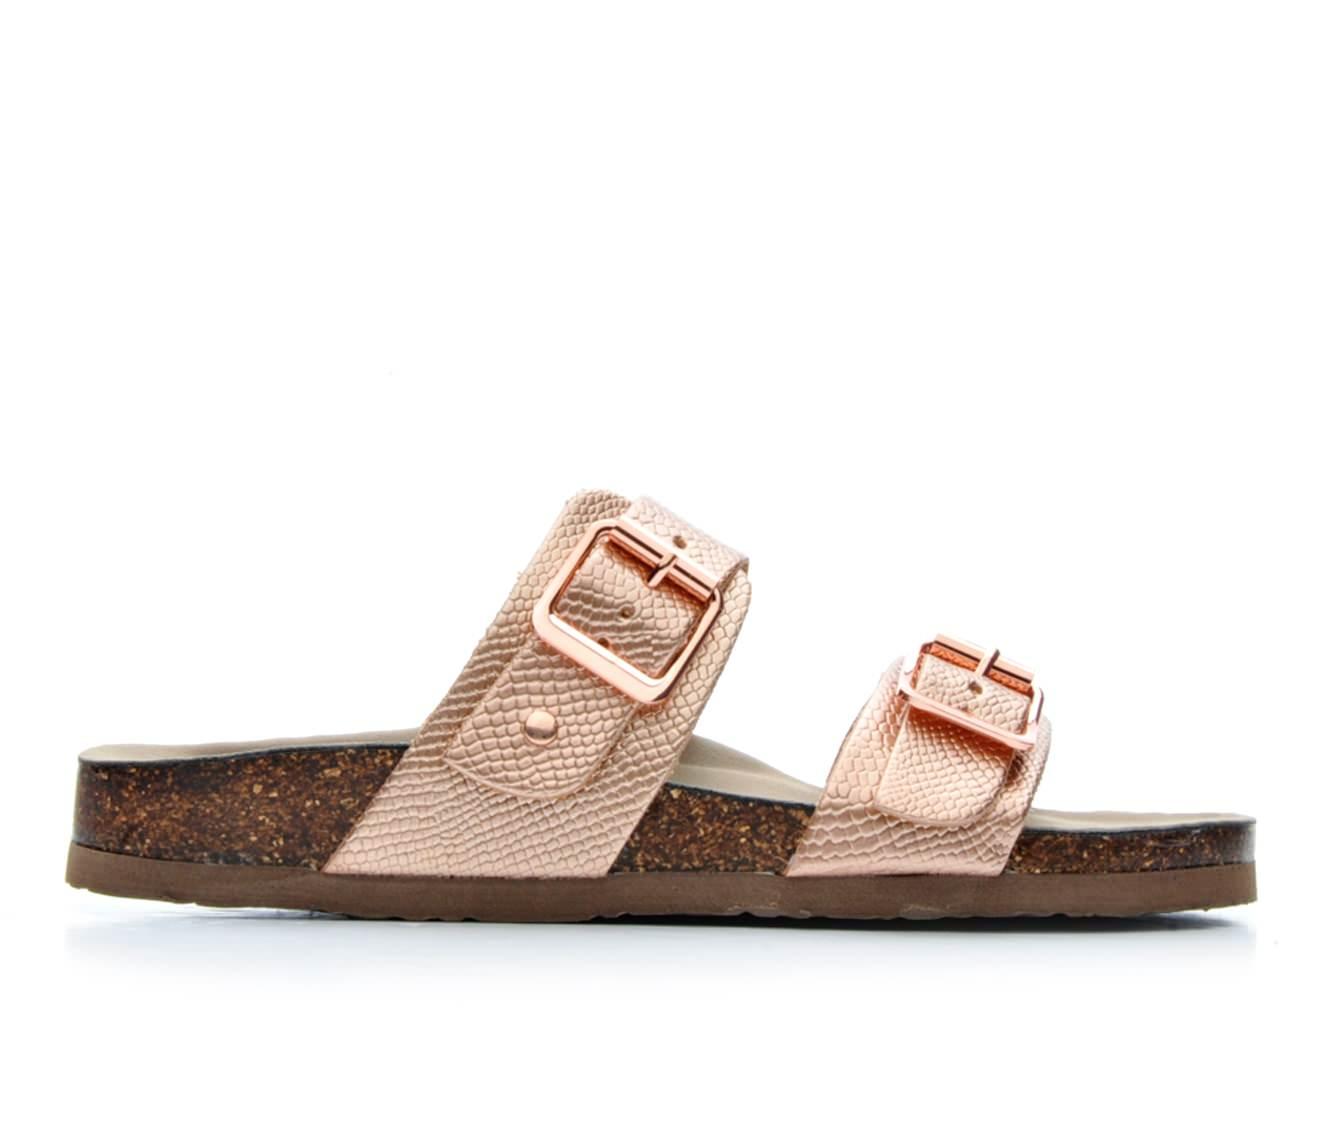 Women's Madden Girl Brando Sandals (Pink)